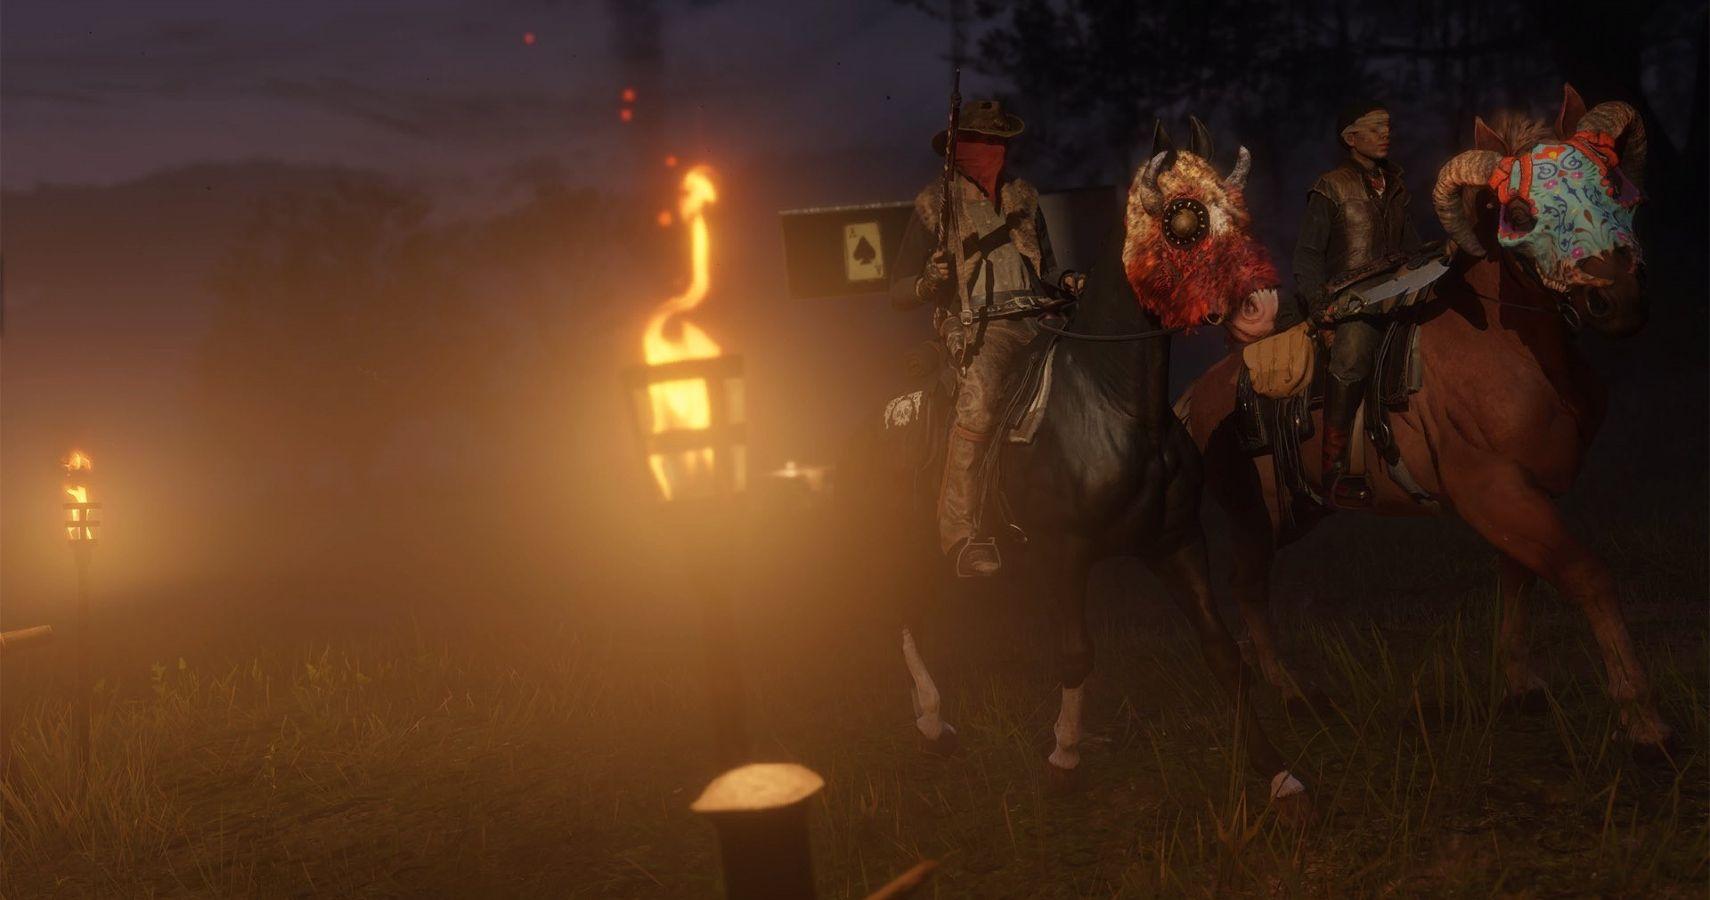 Halloween 2020 Online Leaked Red Dead Online Halloween Pass Leaks Months In Advance | TheGamer